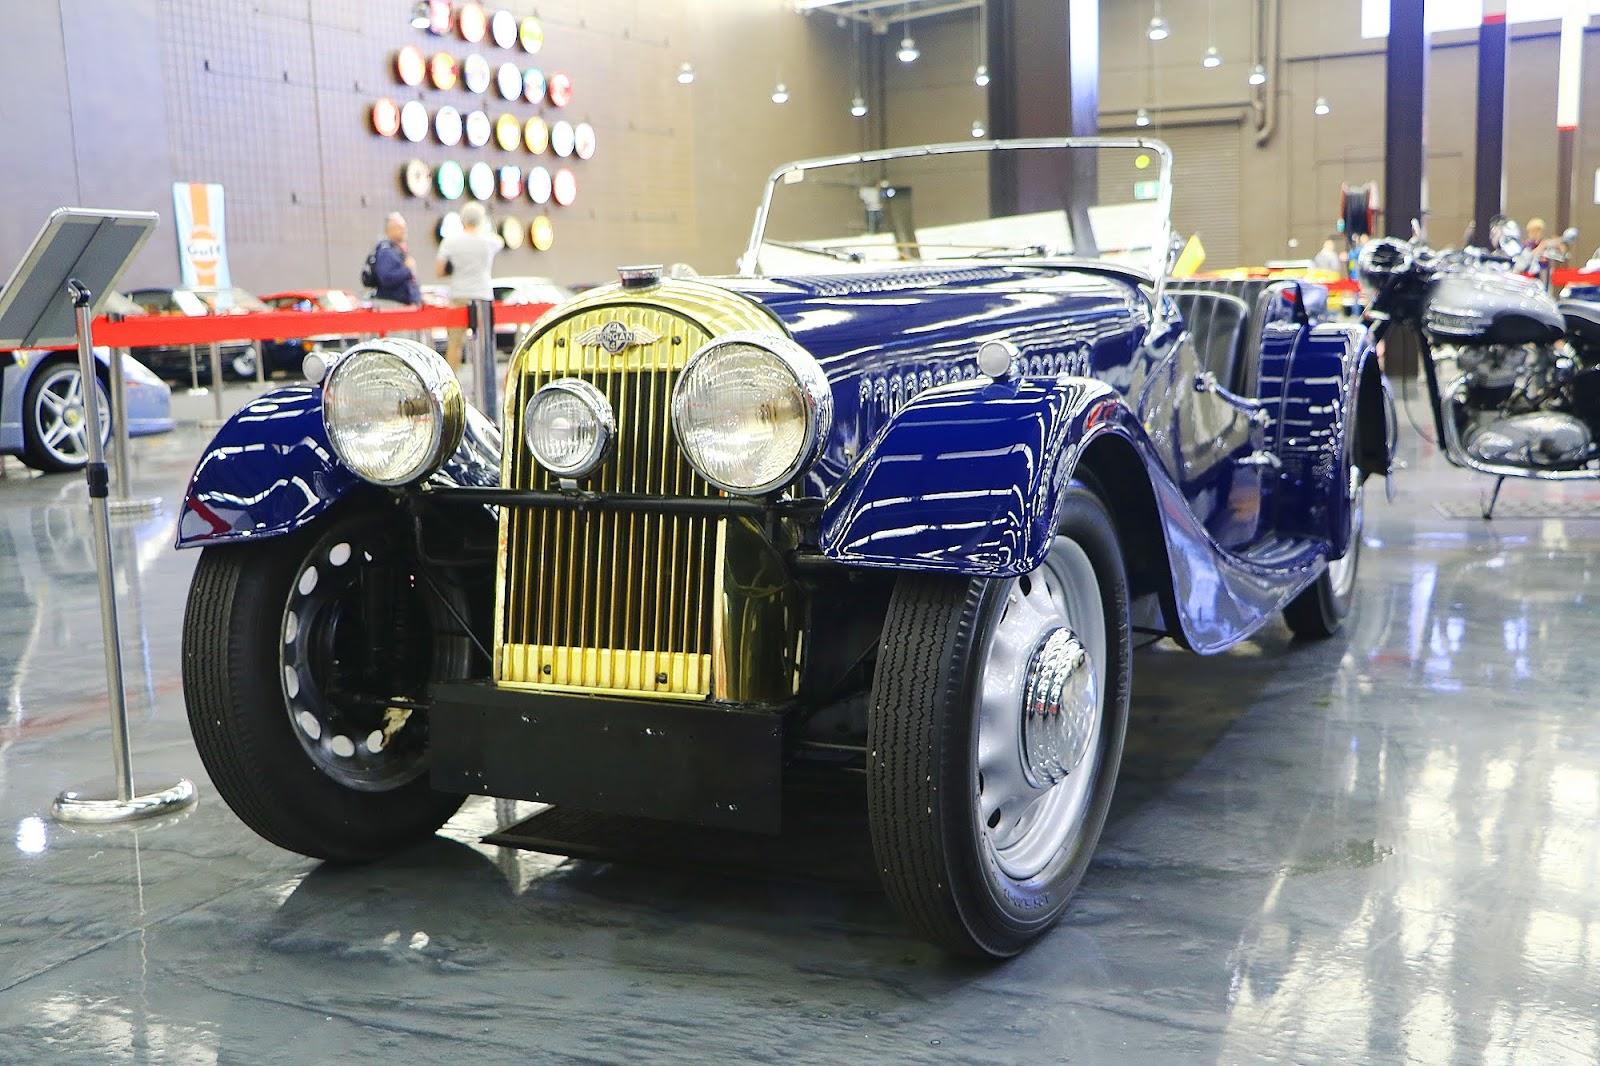 1950 Morgan 4⁄4 Series 1 Roadster (15).jpg